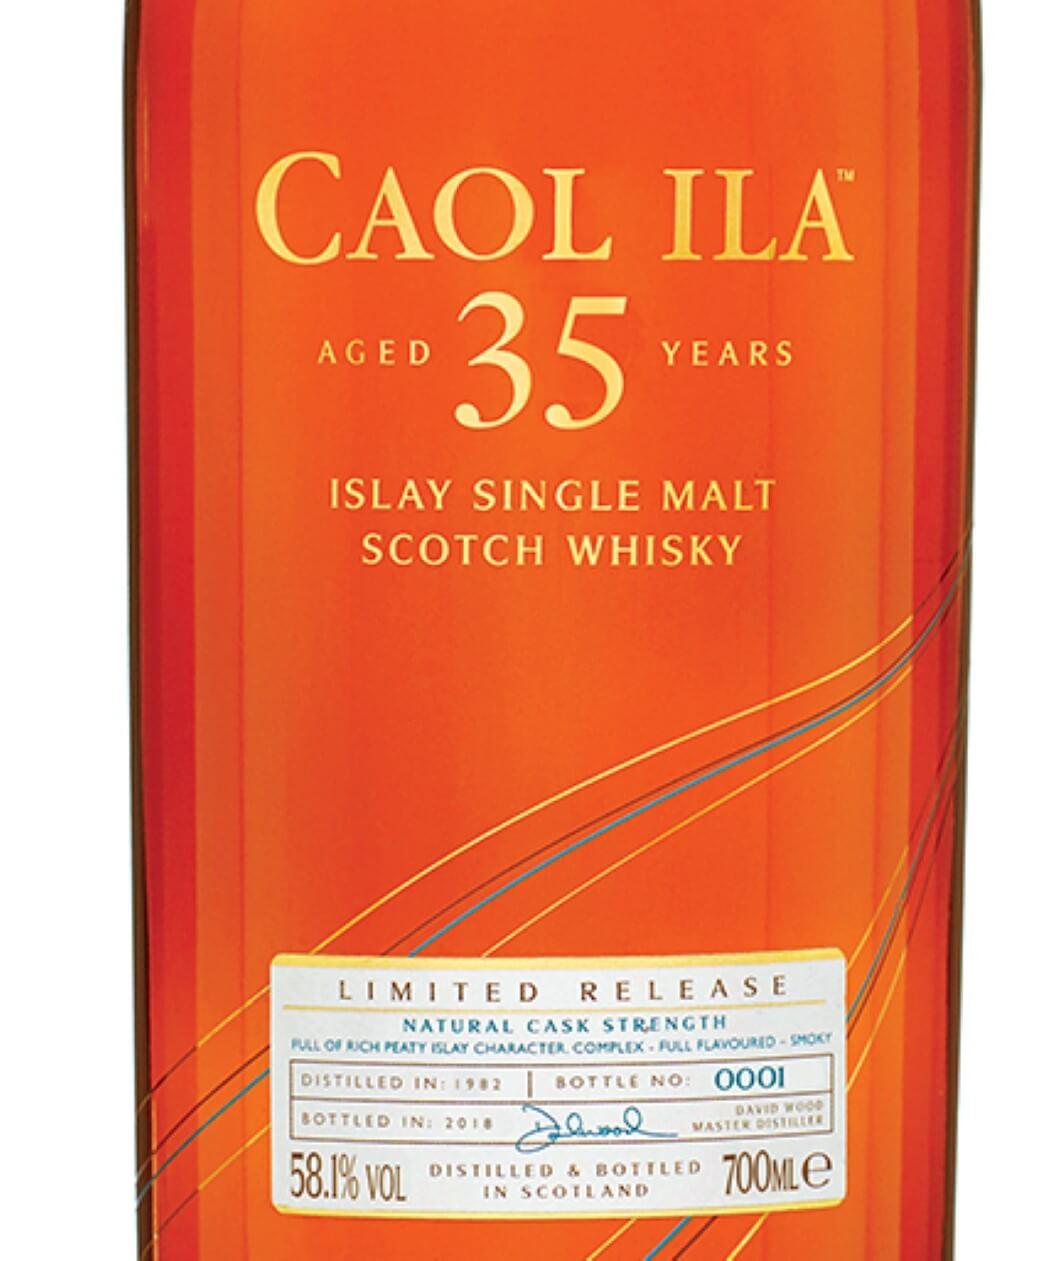 Caol Ila, Aged 35 Years